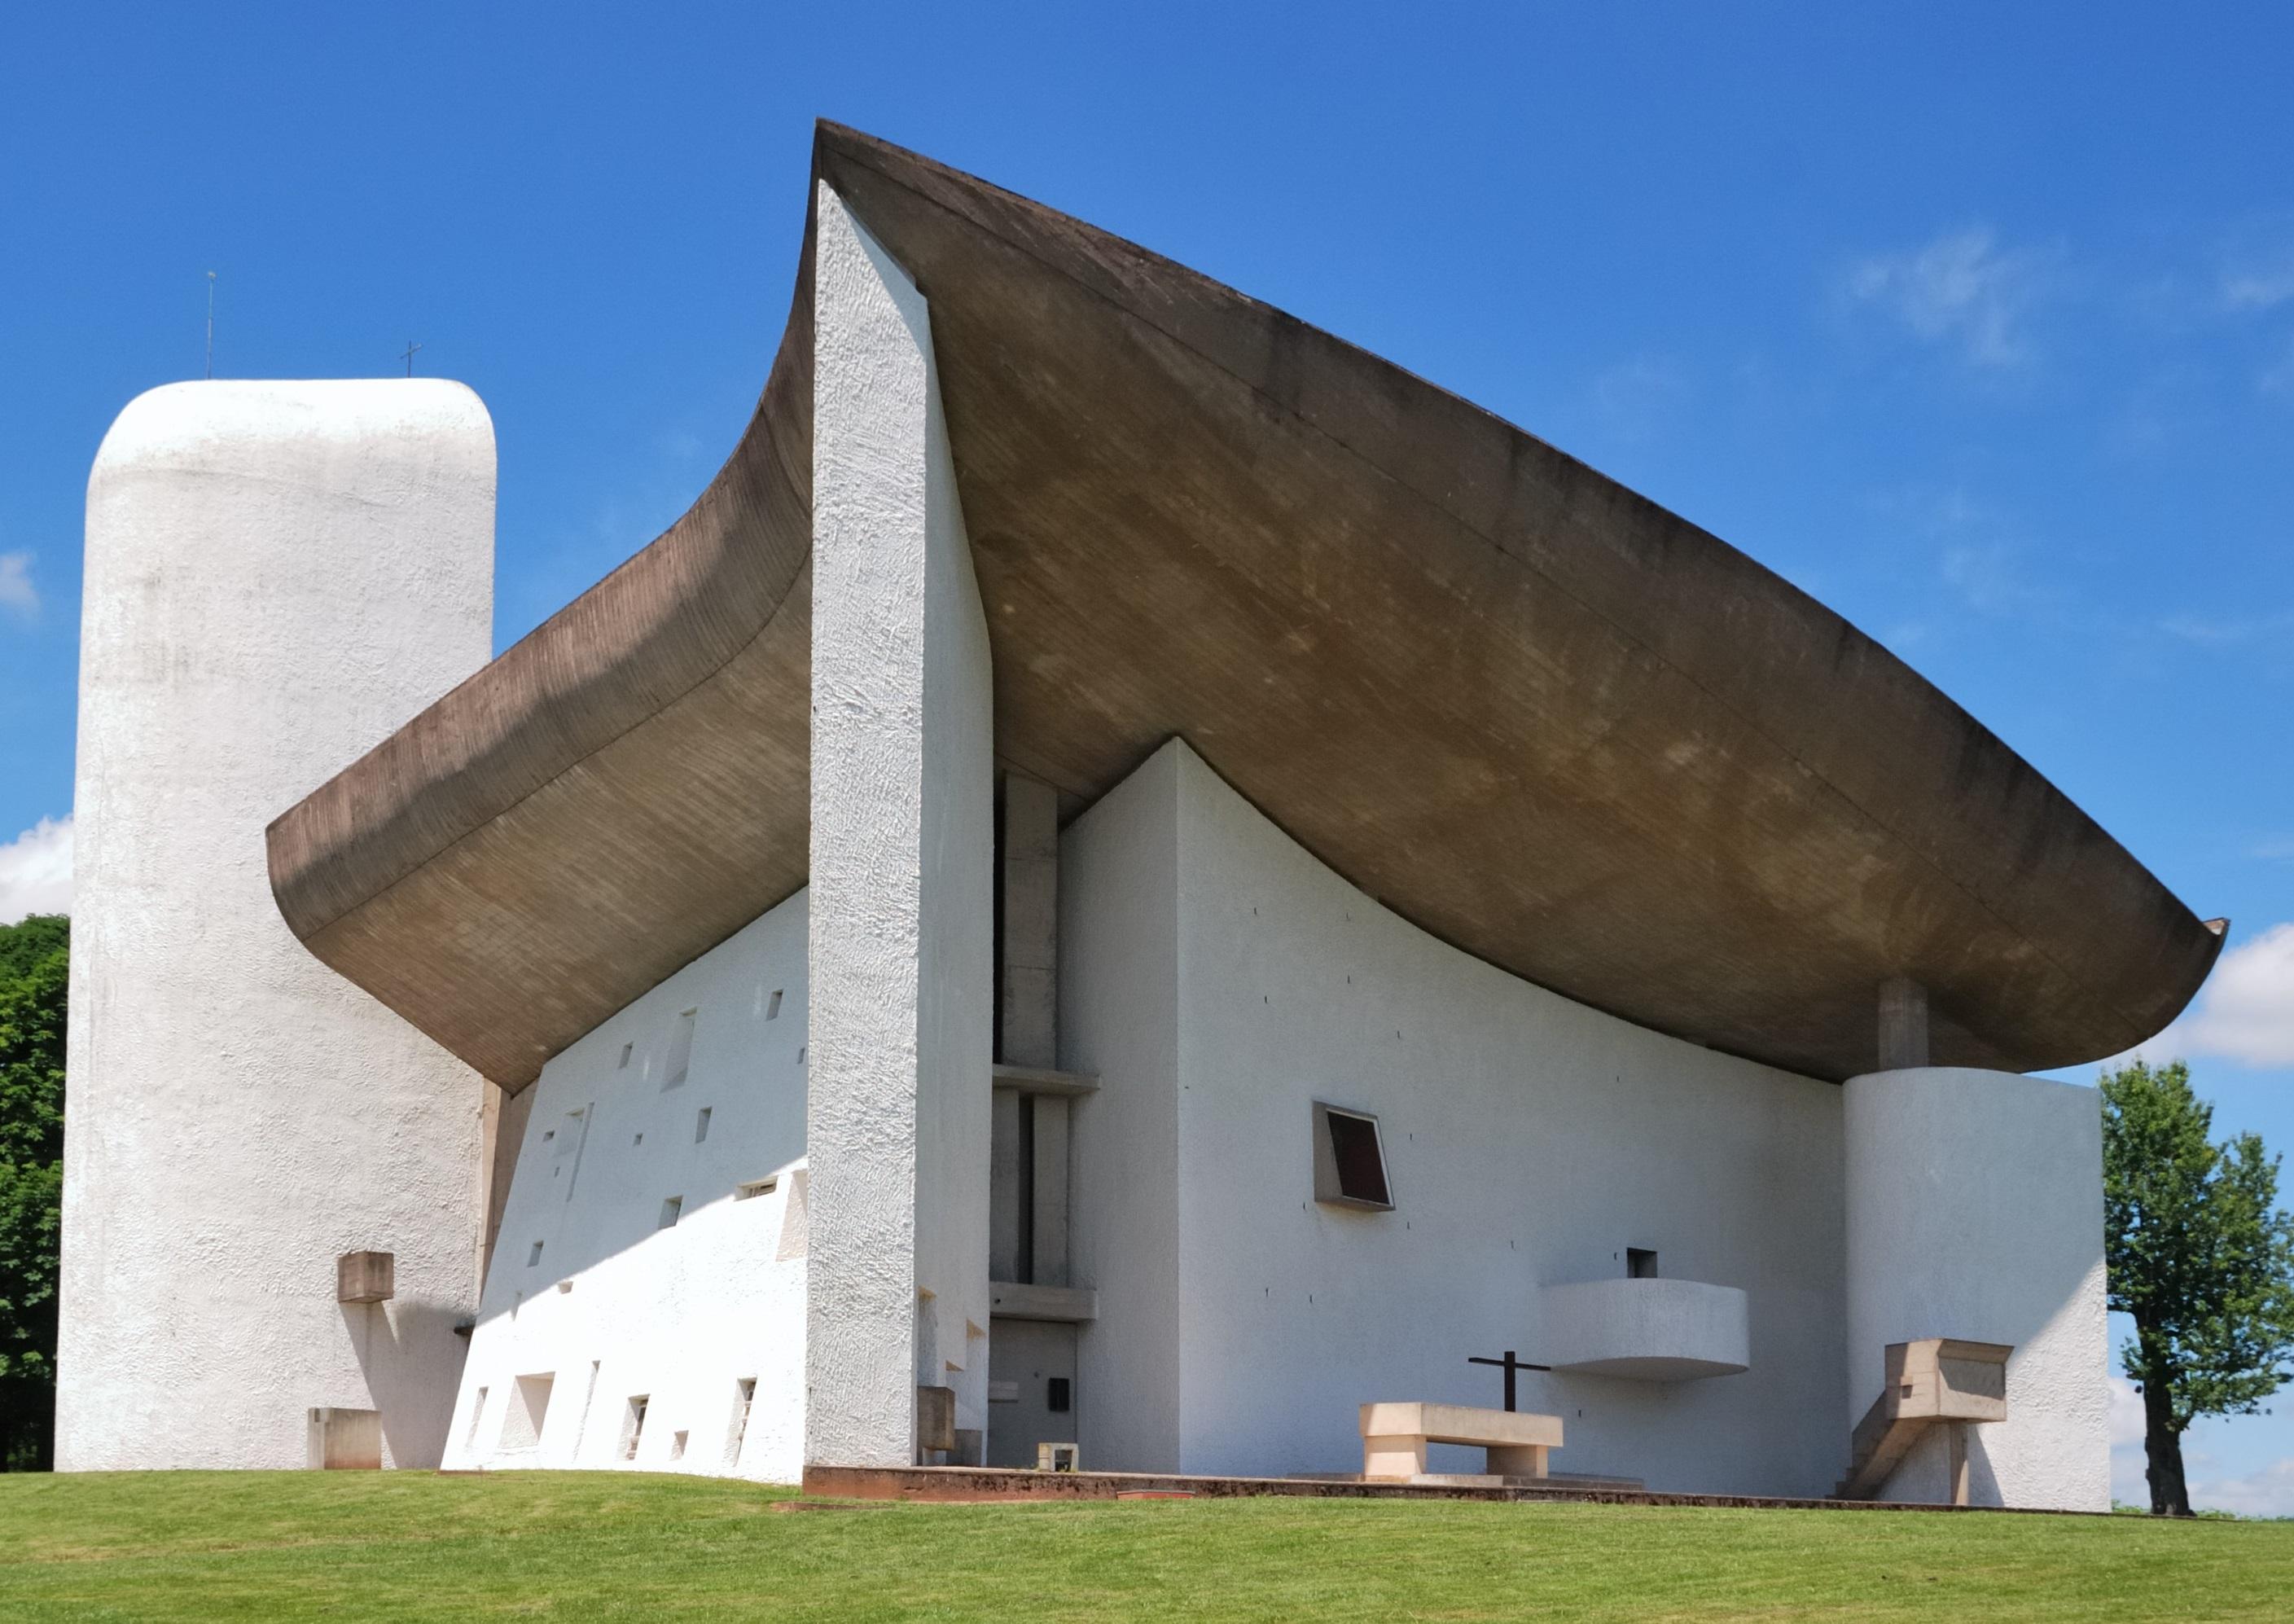 Na seznam UNESCO se dostaly stavby od Le Corbusiera a Niemeyera